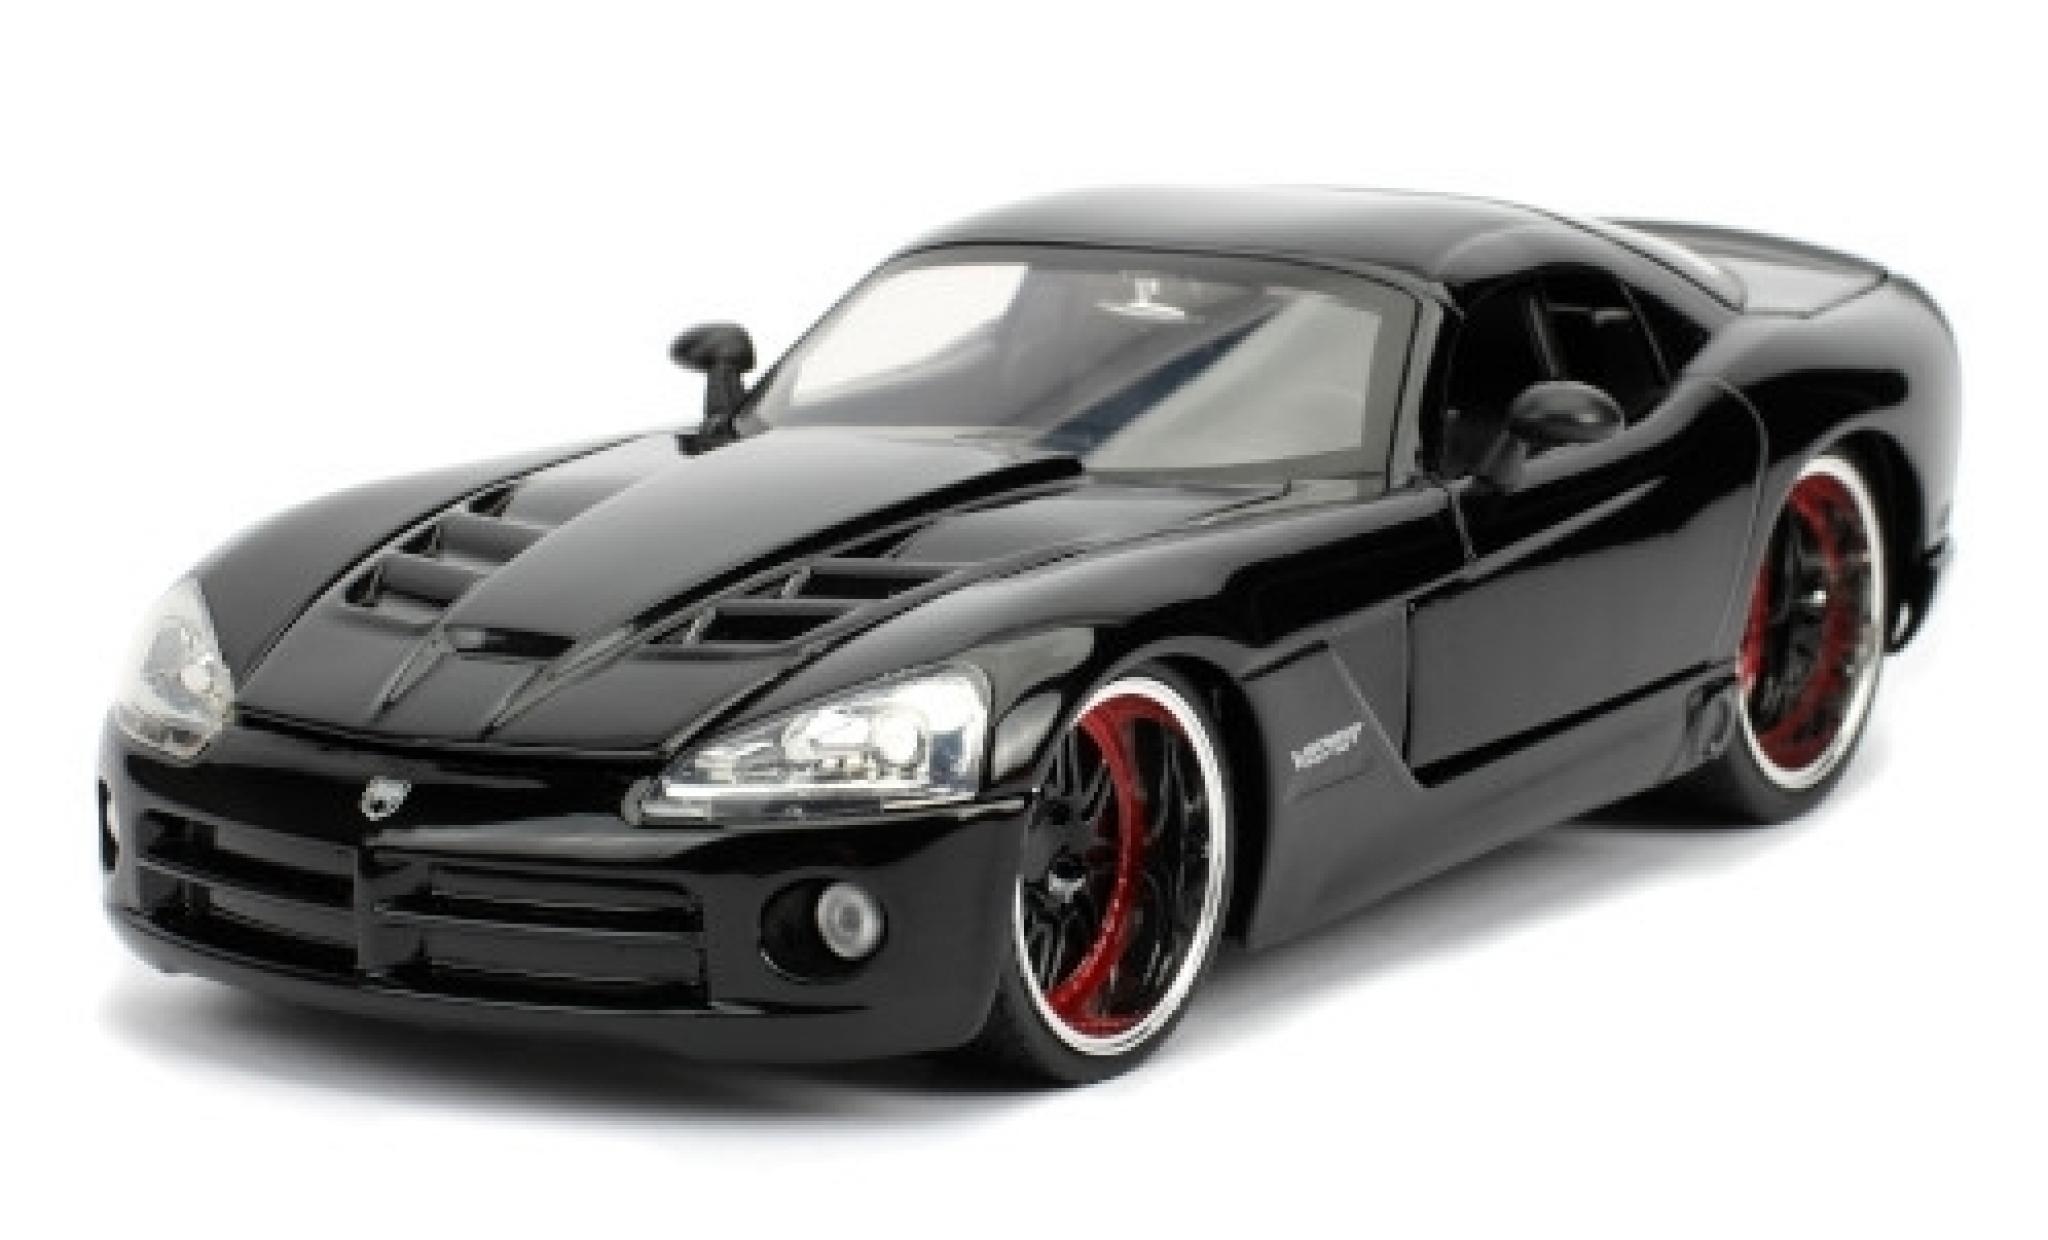 Dodge Viper 1/24 Jada t SRT-10 Tuning noire Fast & Furious